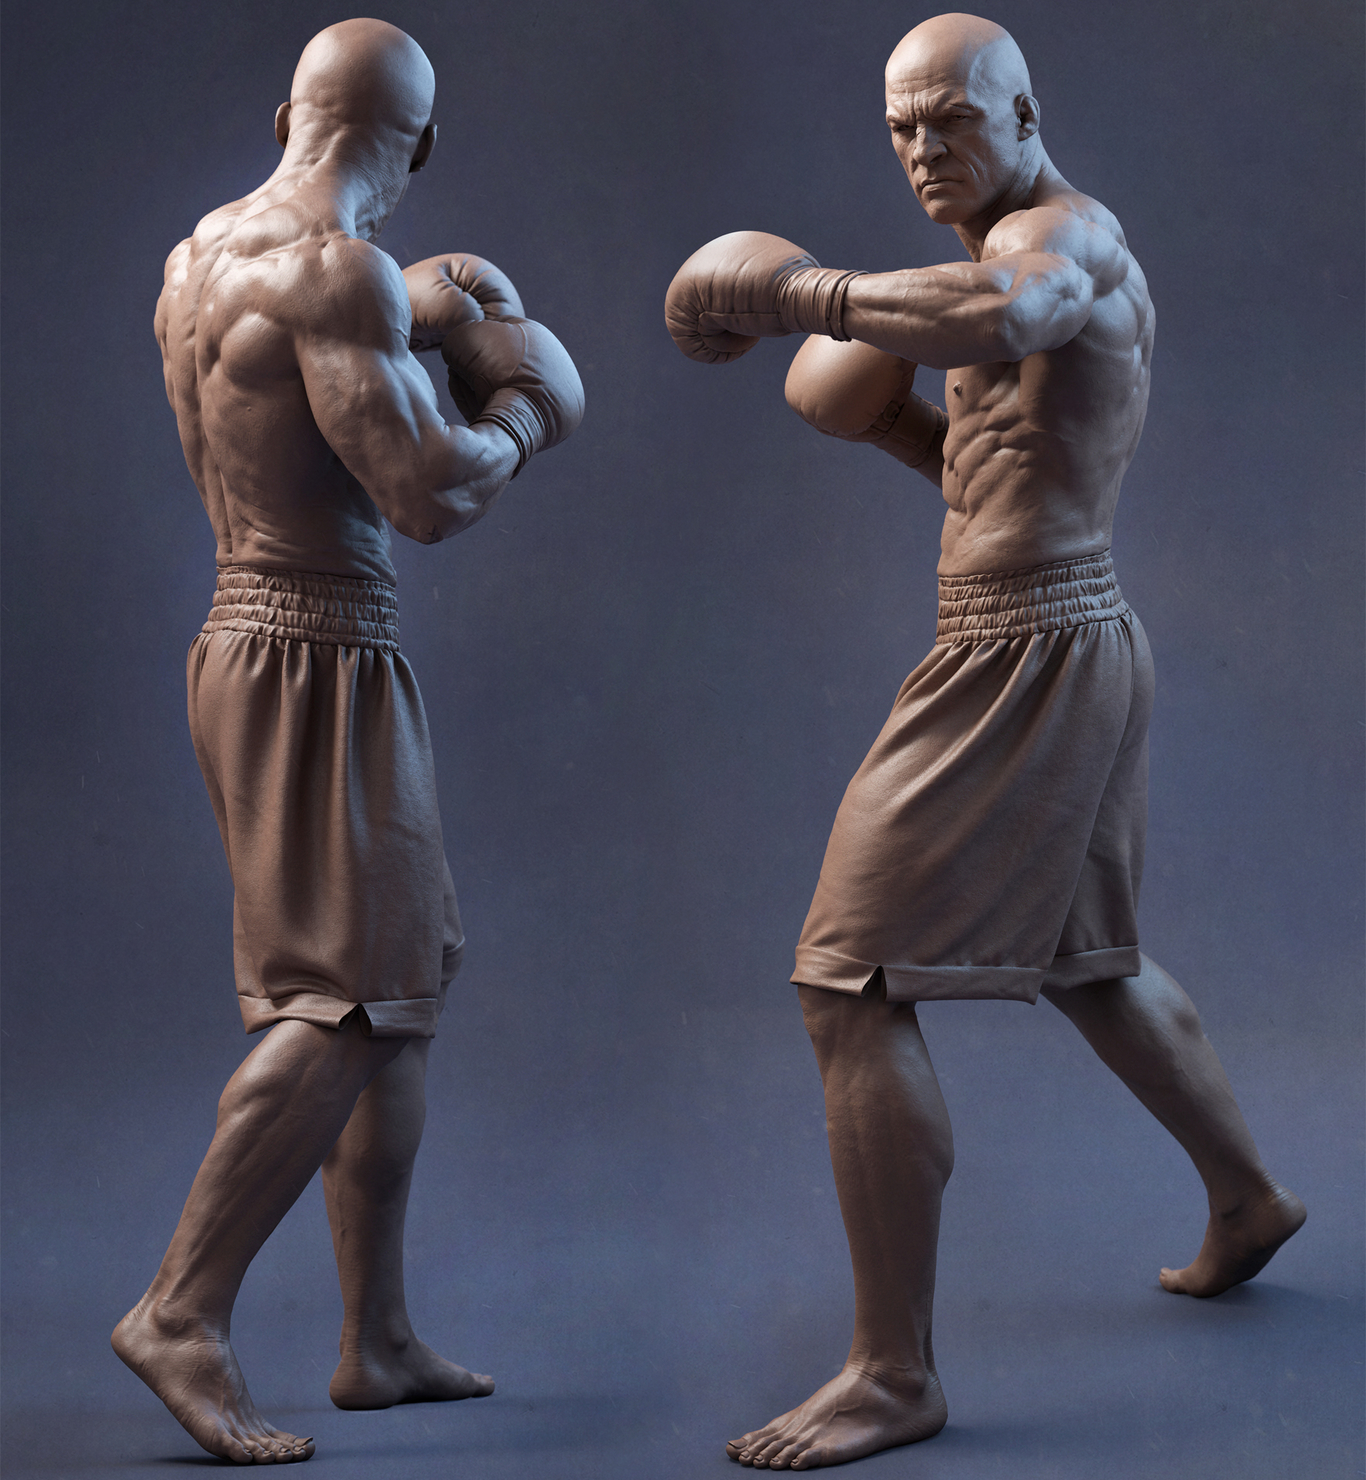 Sandeepvs boxer turnaround 1 83b028a3 57lk